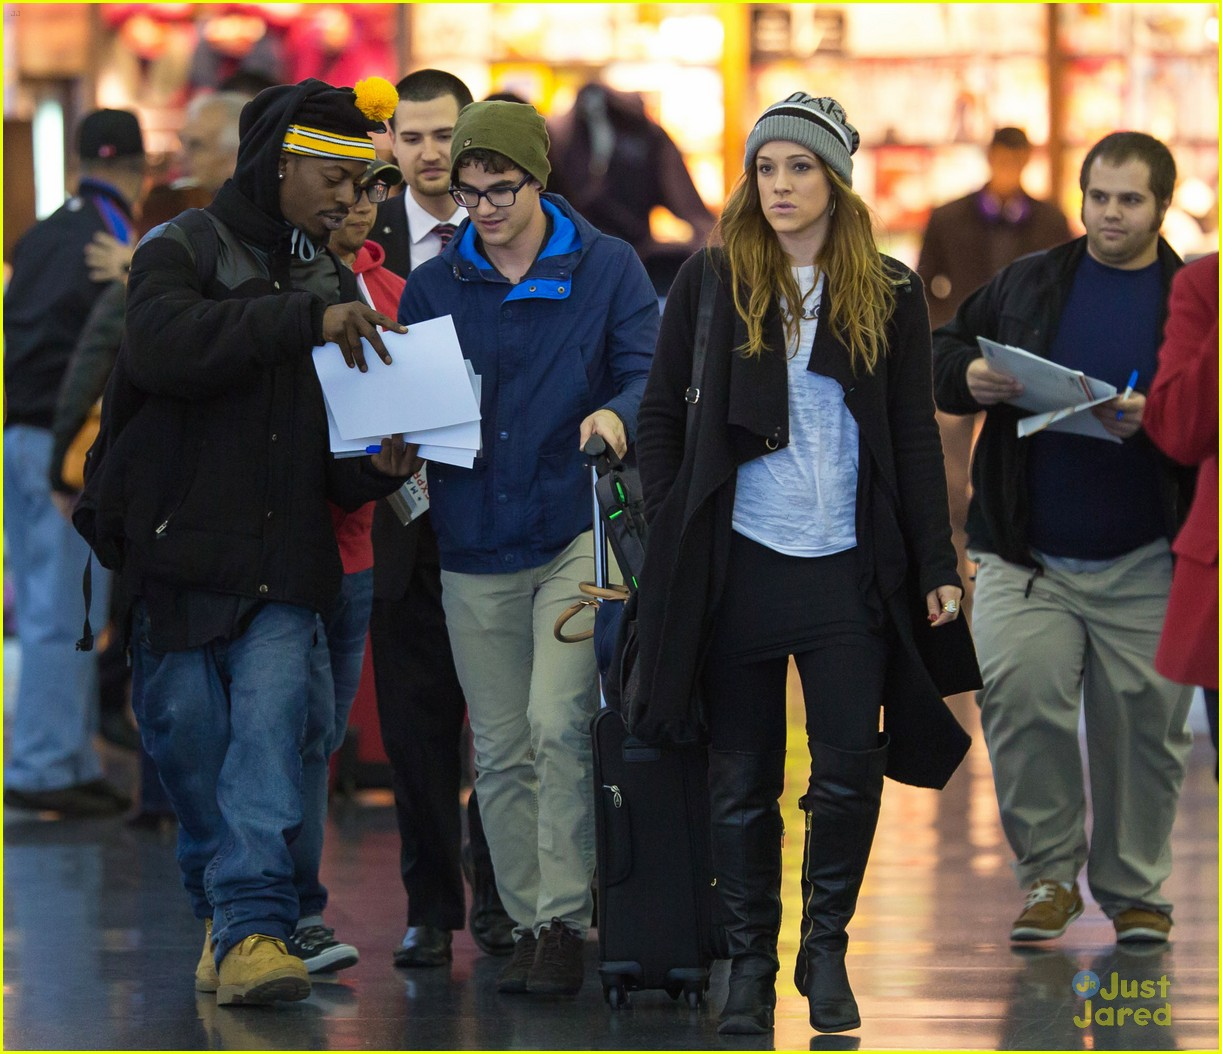 Looking Ahead on 'Glee': Darren Criss Dishes On What's ... Vanessa Hudgens Boyfriend